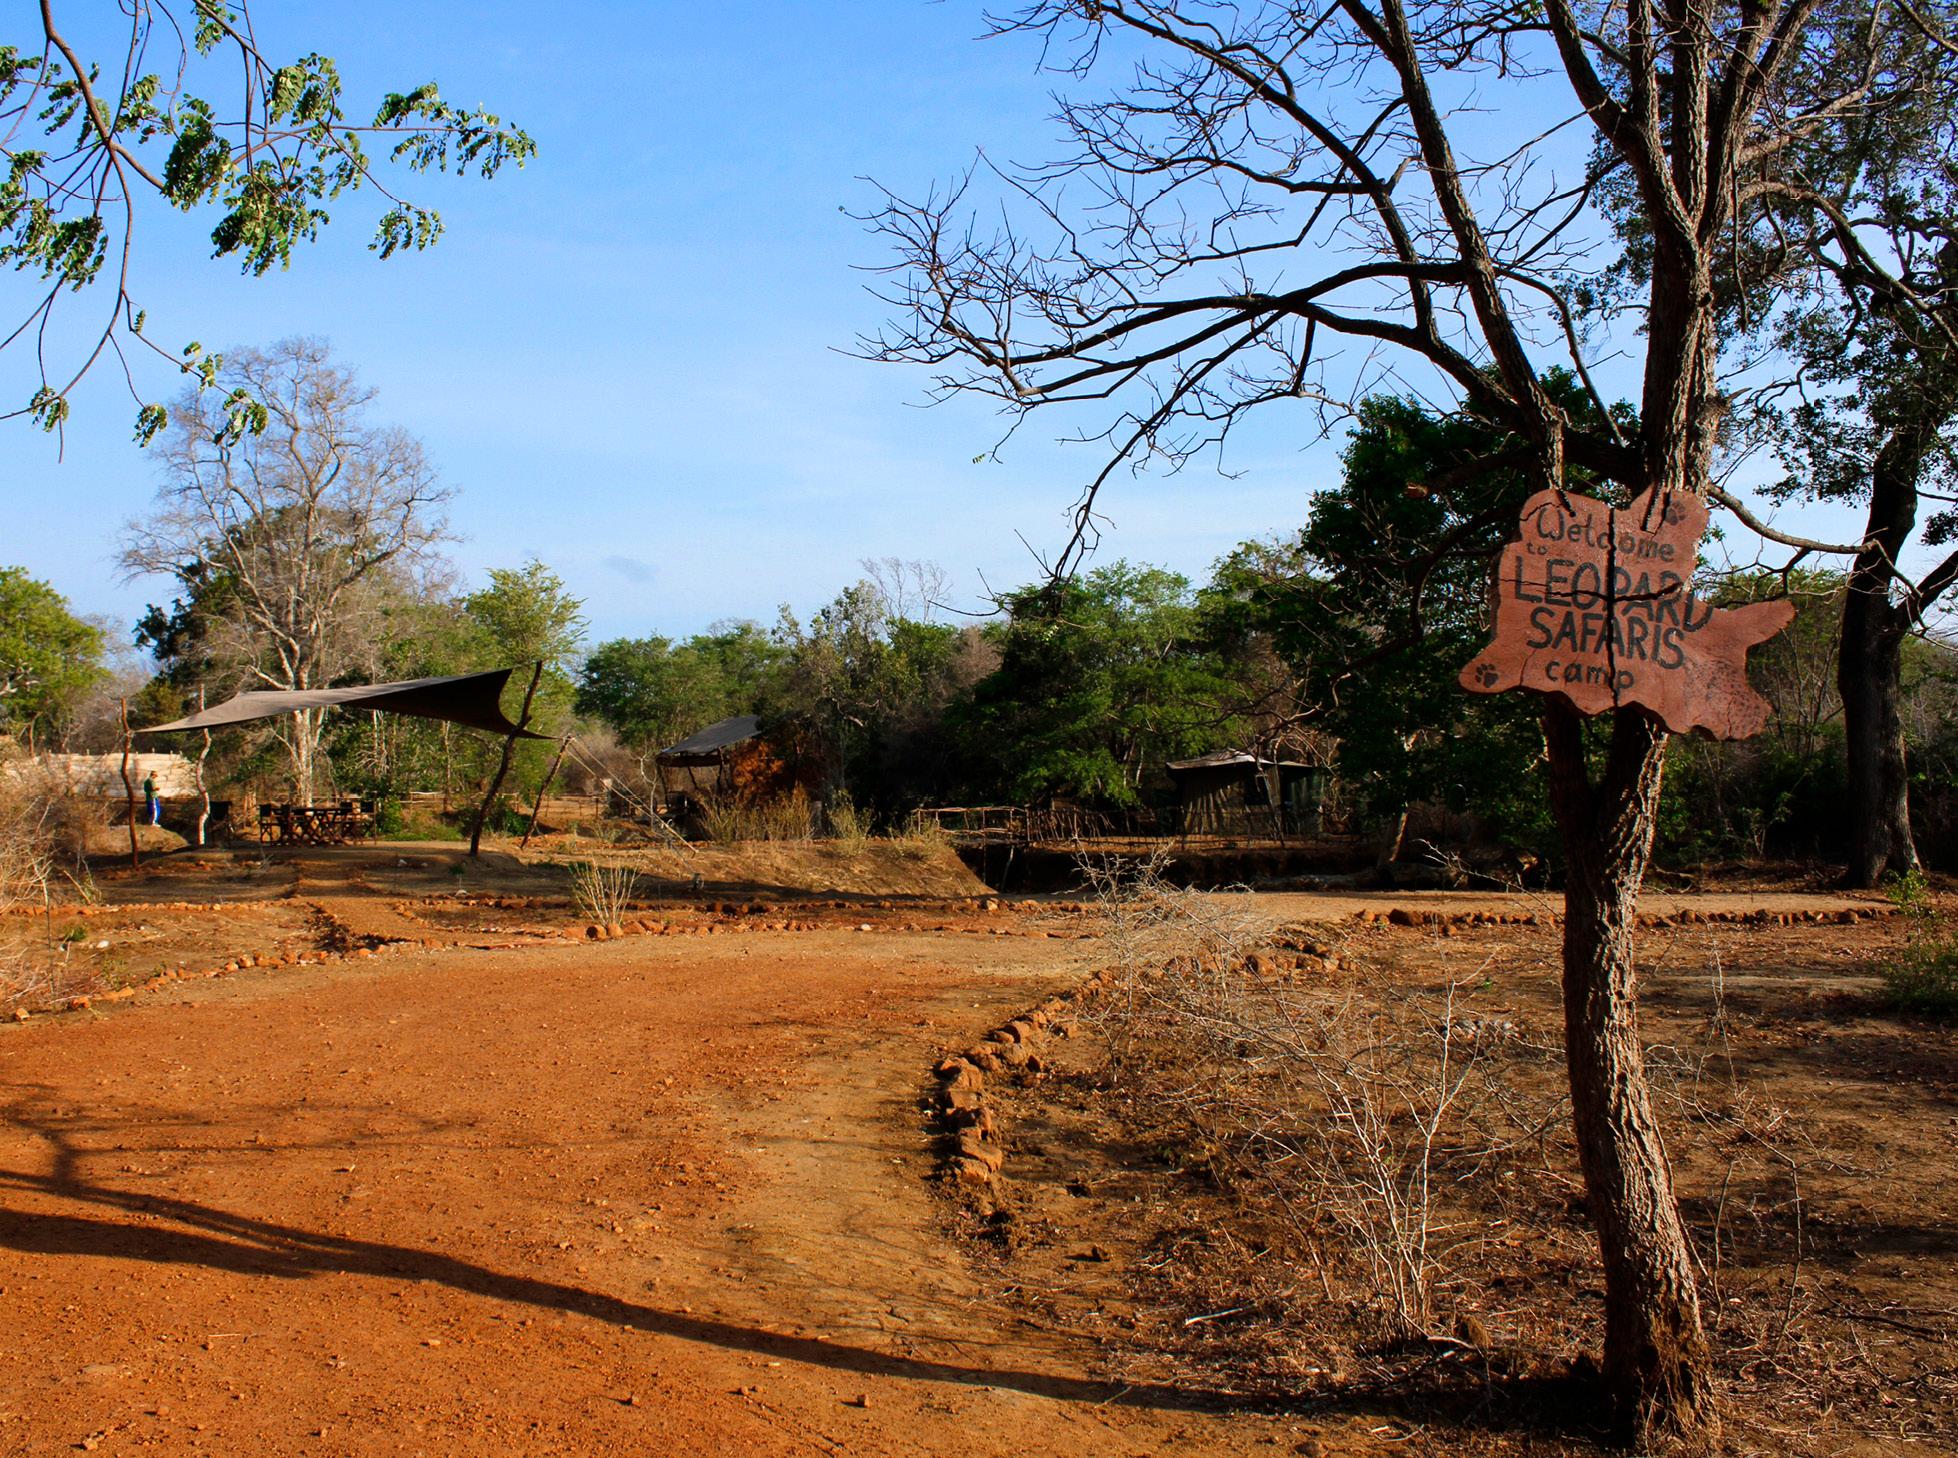 noel-rodrigo-leopard-safari-yala-national-park-sri-lanka-camp-2